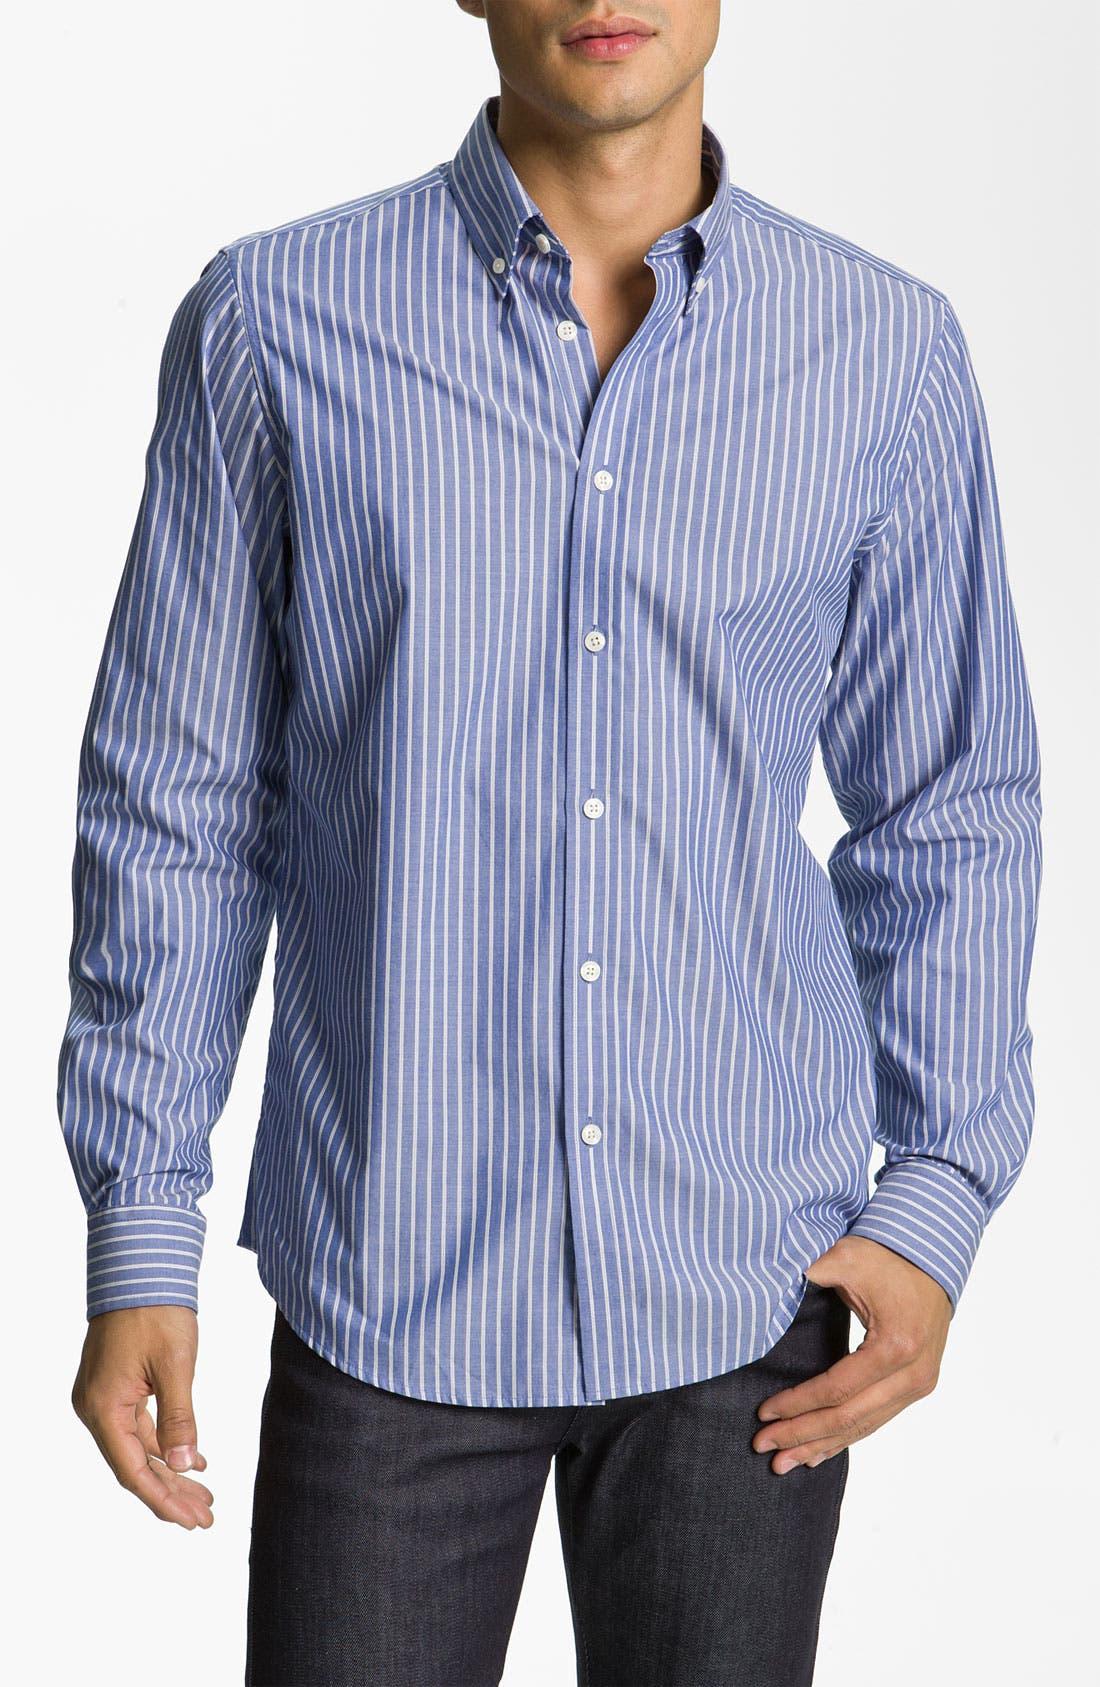 Main Image - Ben Sherman 'Clerkenwell' Stripe Woven Shirt